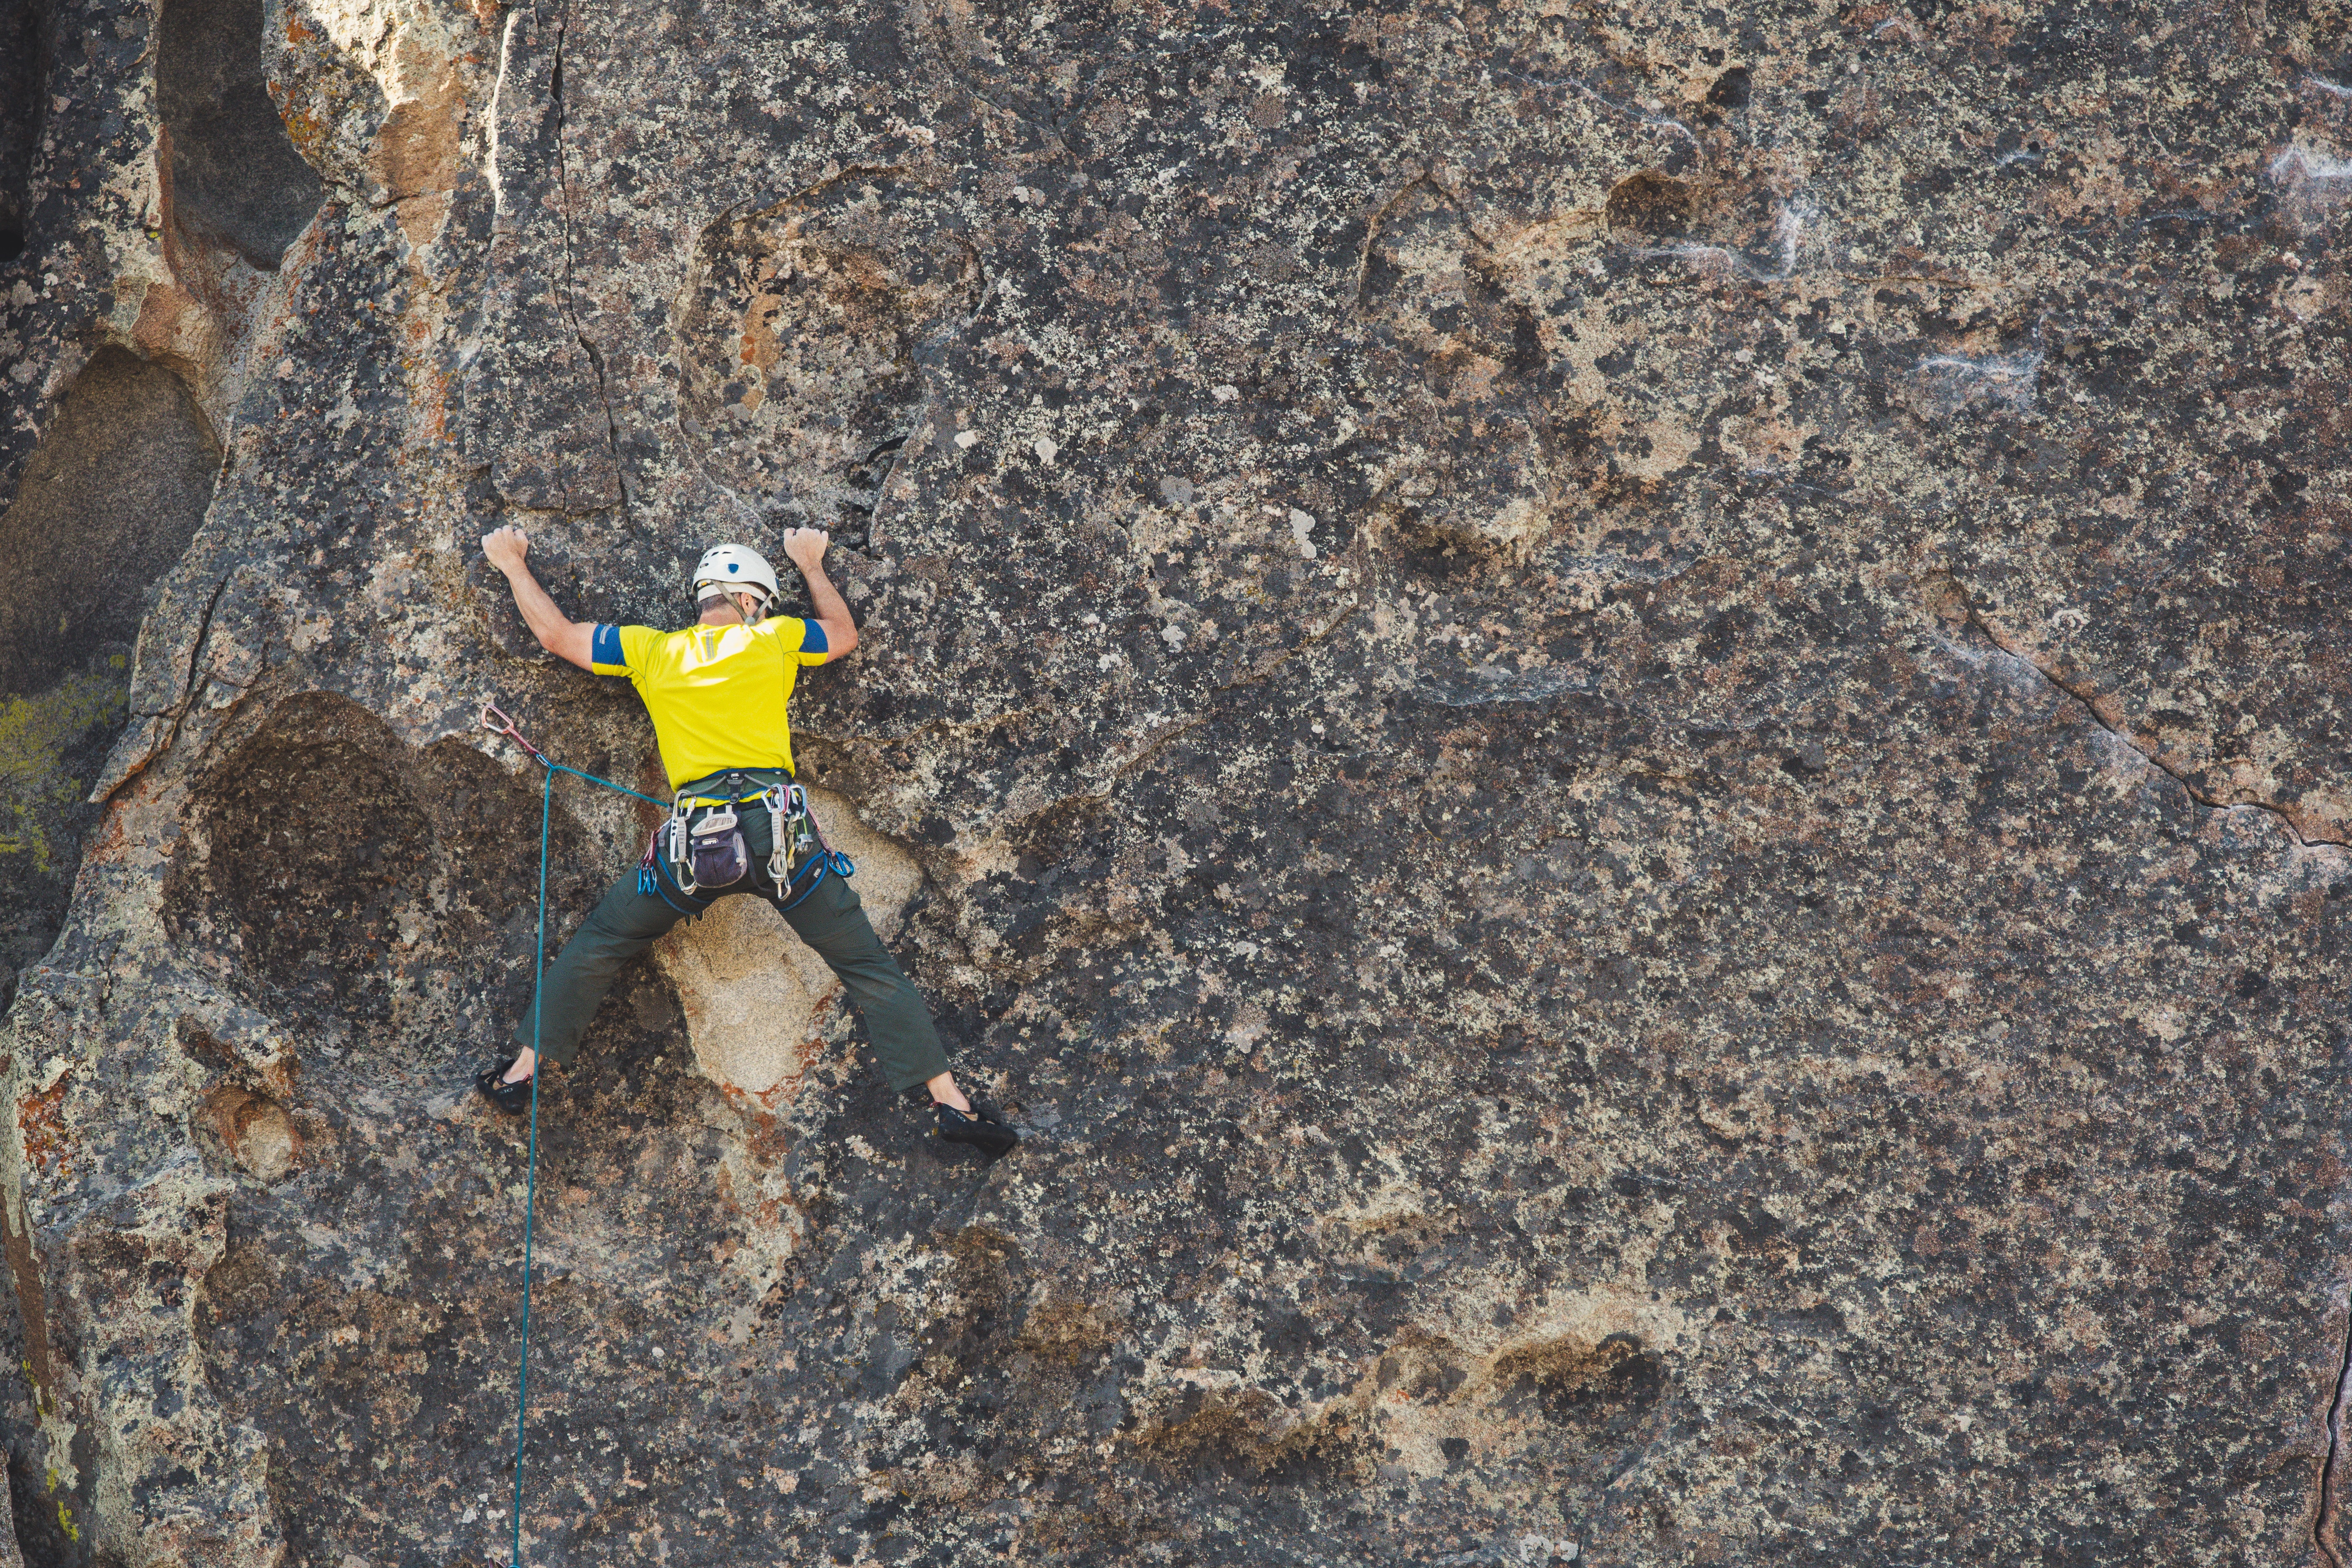 1000 amazing rock climbing photos · pexels · free stock photosbrett sayles photo of mountain climber